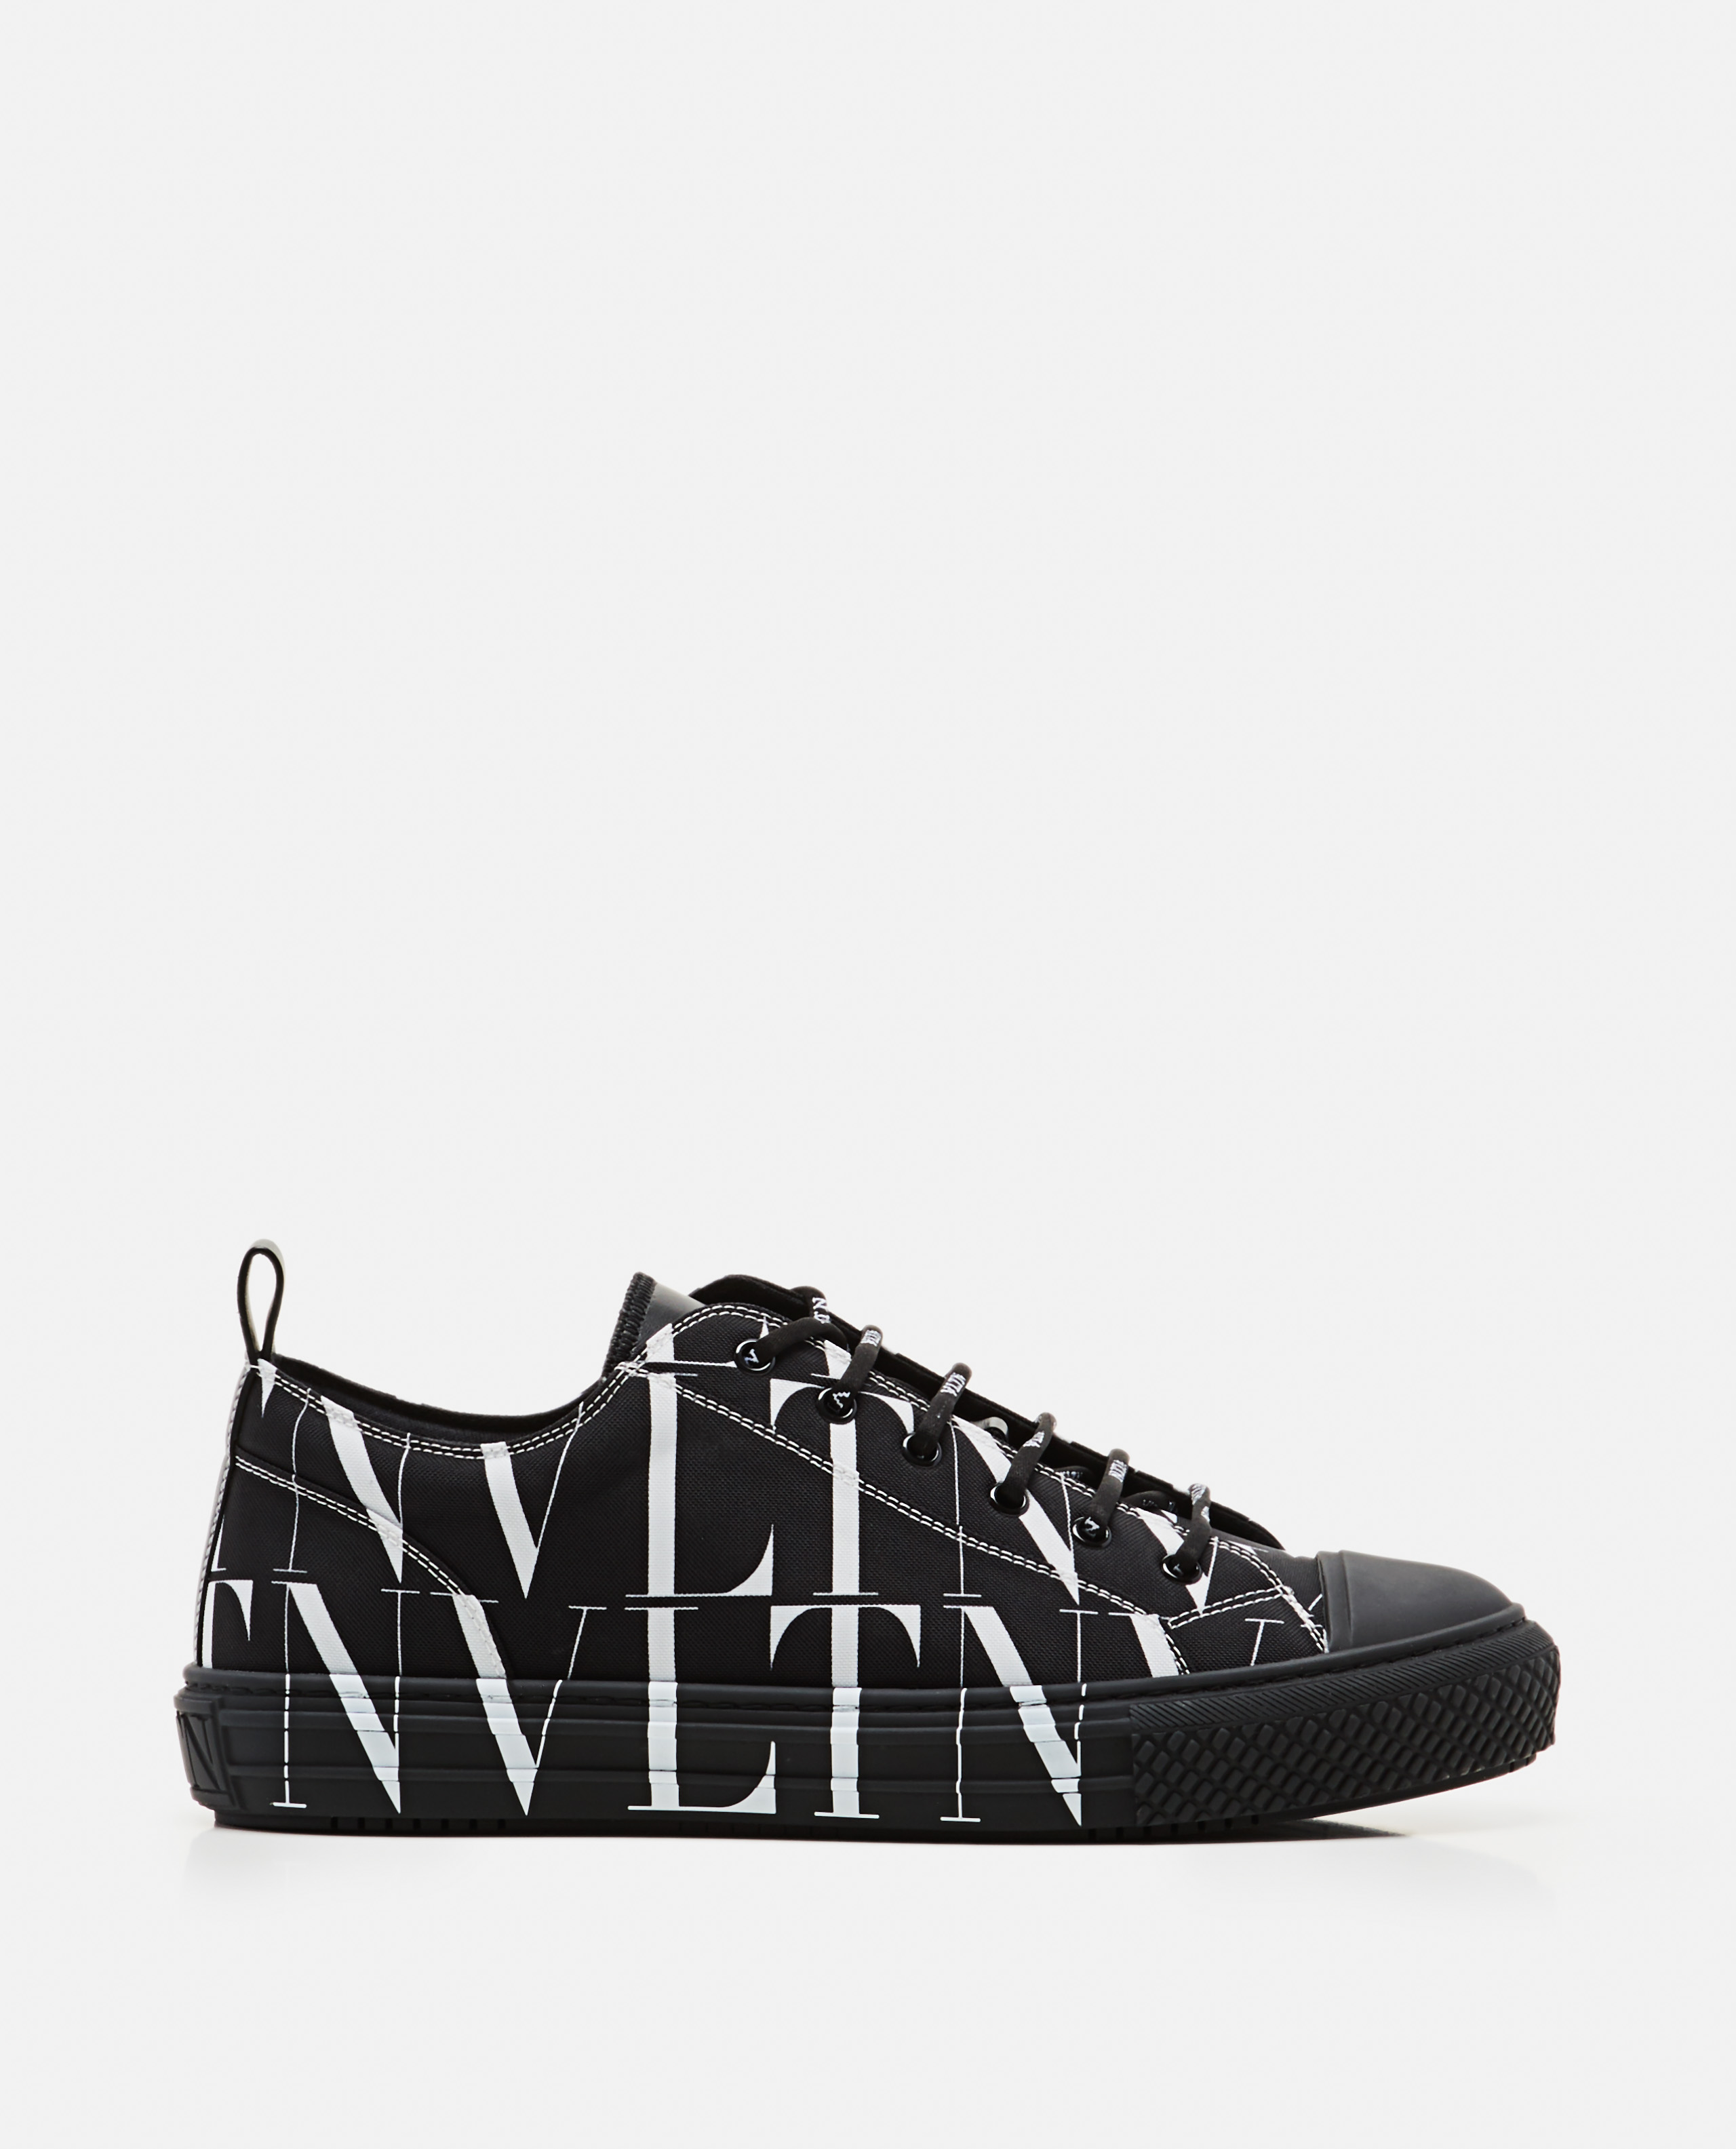 Valentino Garavani low-top sneaker